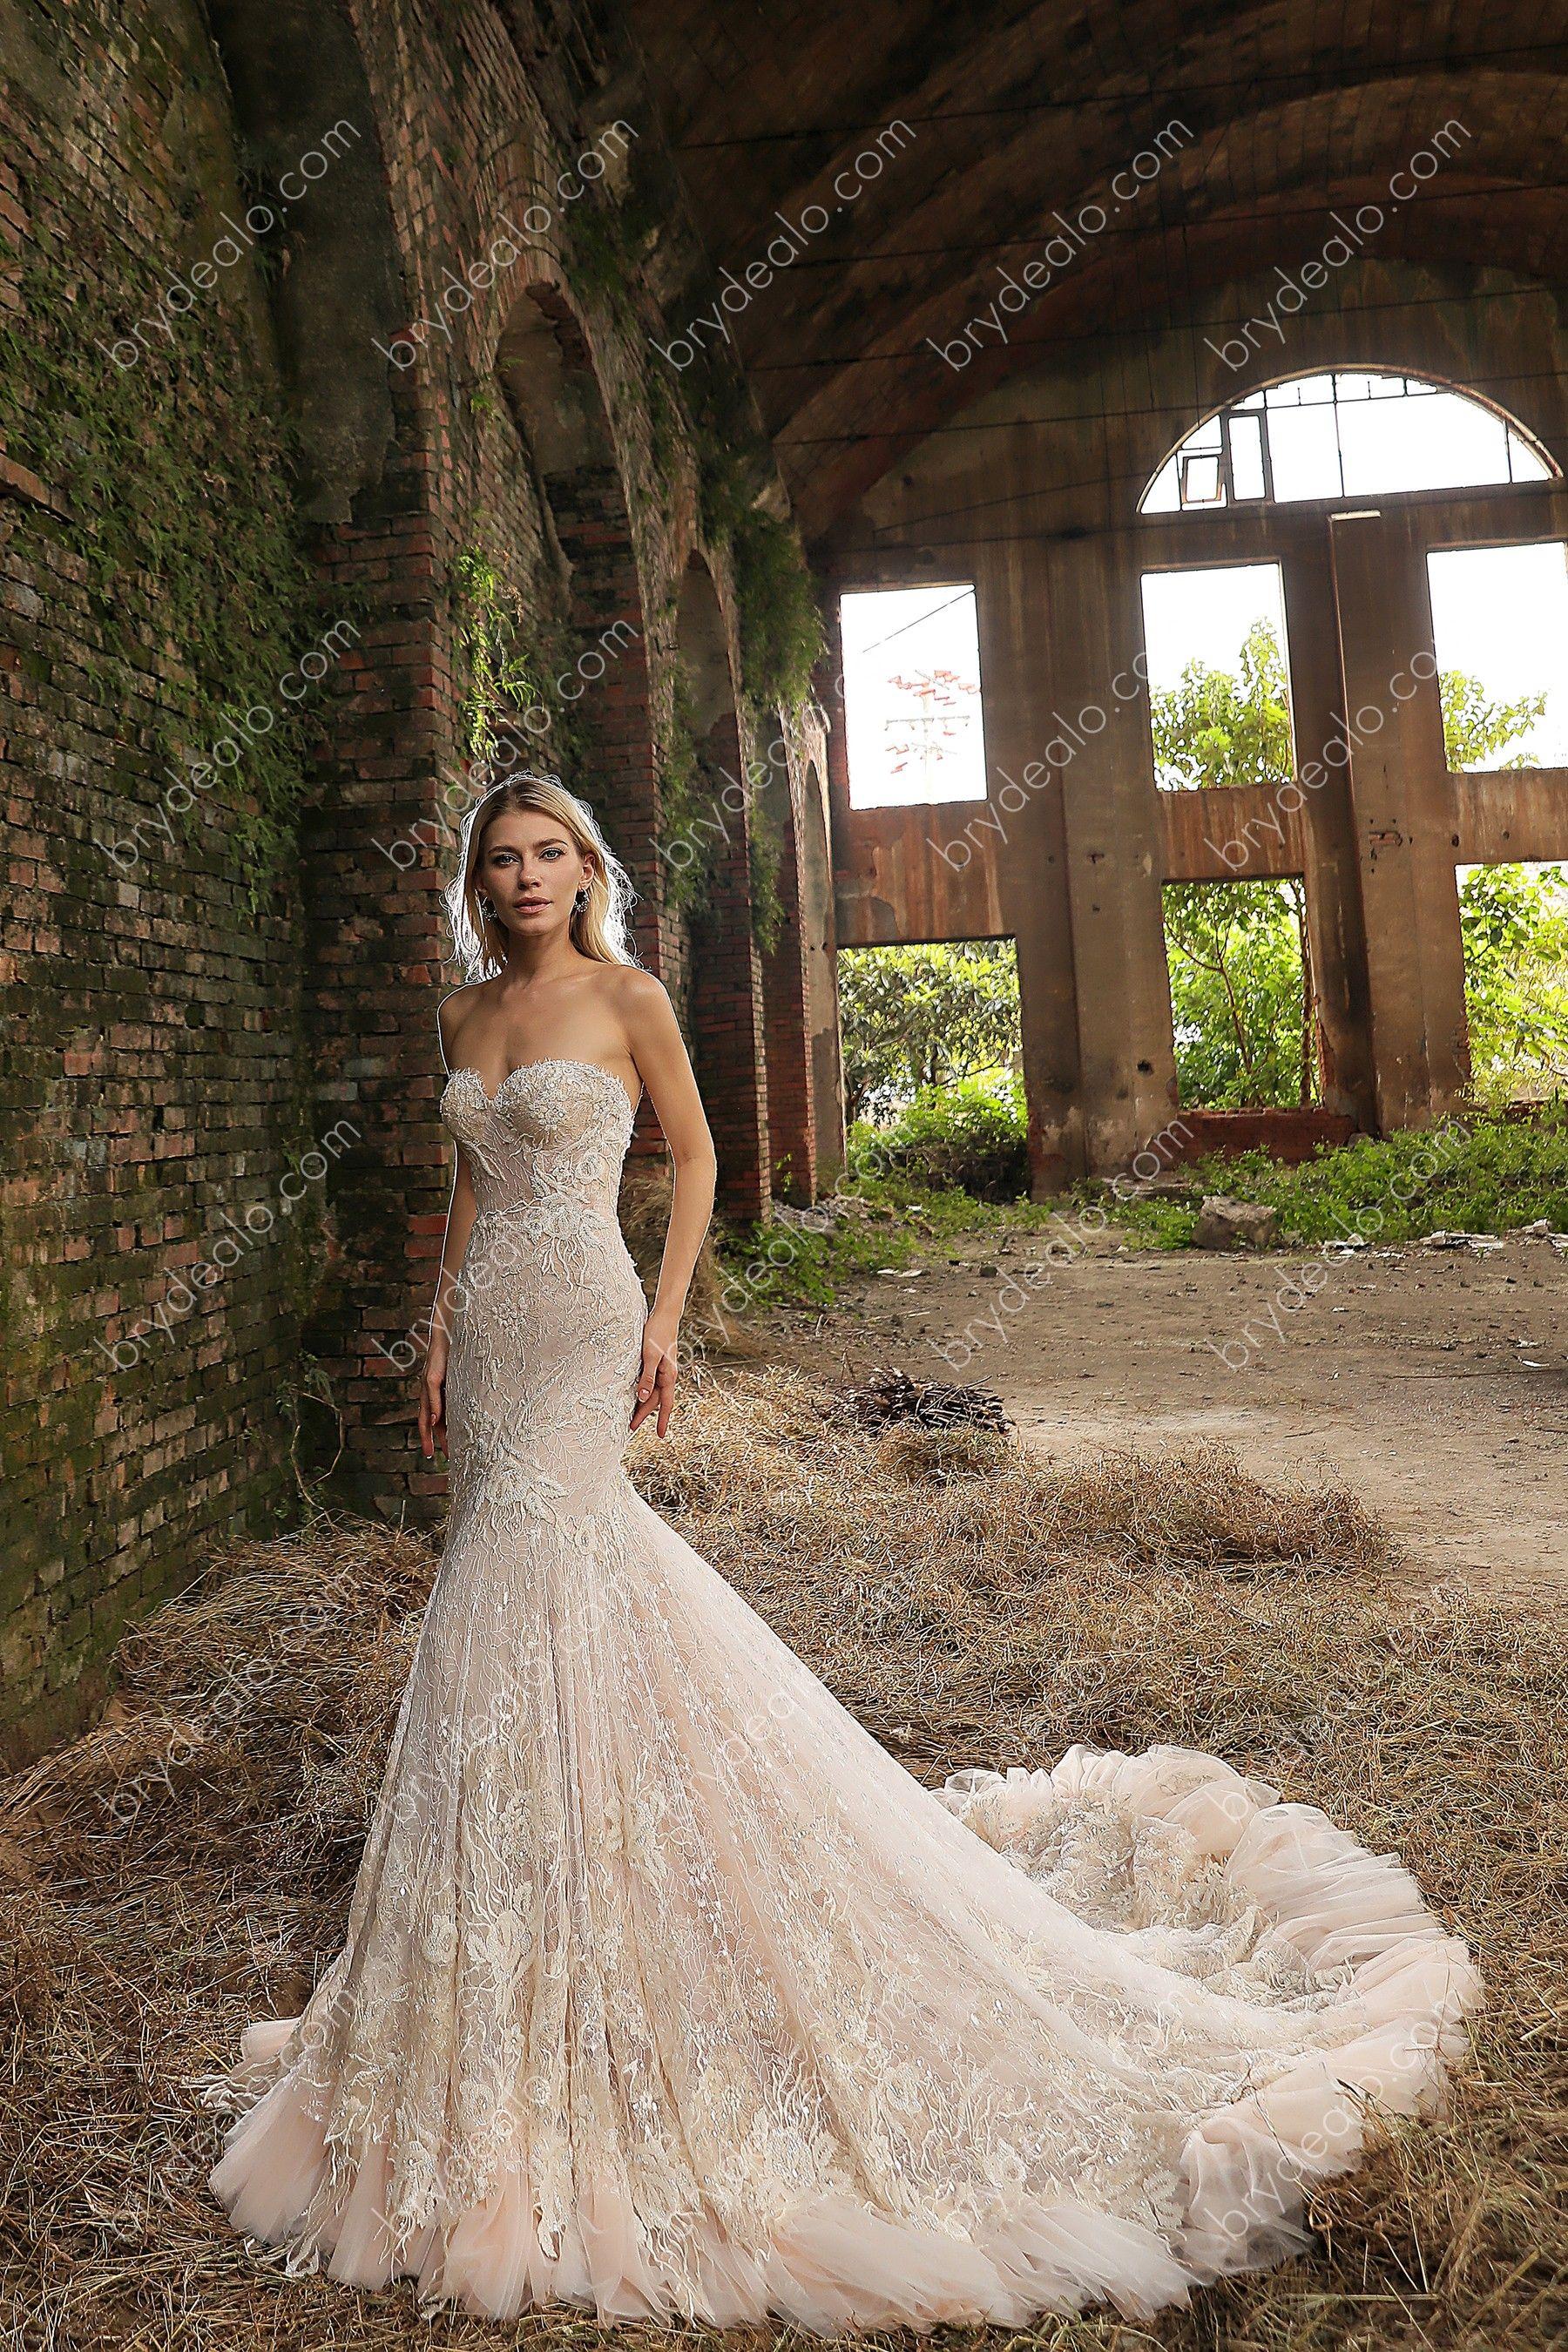 Wholesale Luxury Strapless Sweetheart Long Mermaid Bridal Gown ...